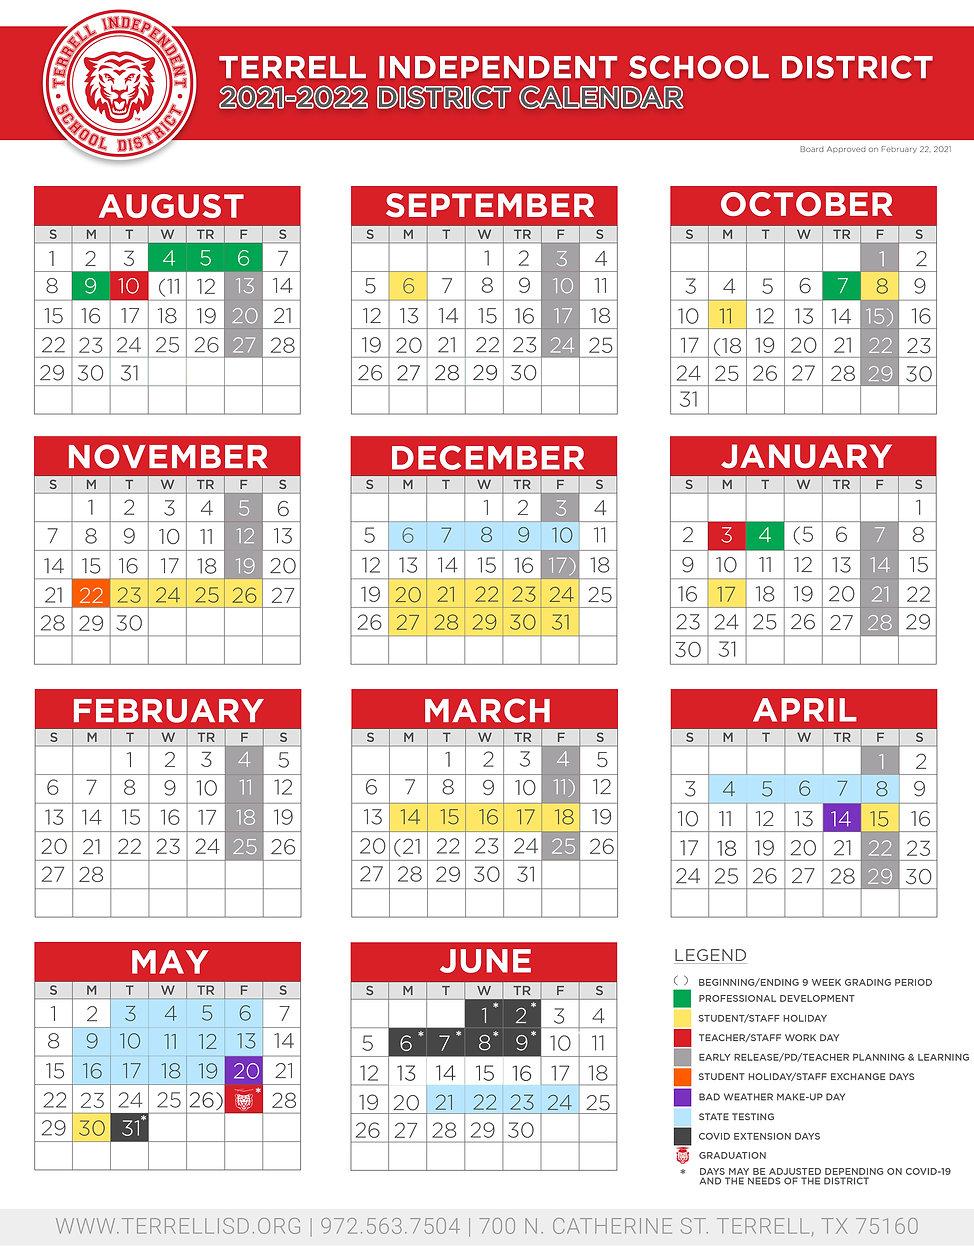 FINAL 2021-2022 Calendar.jpg